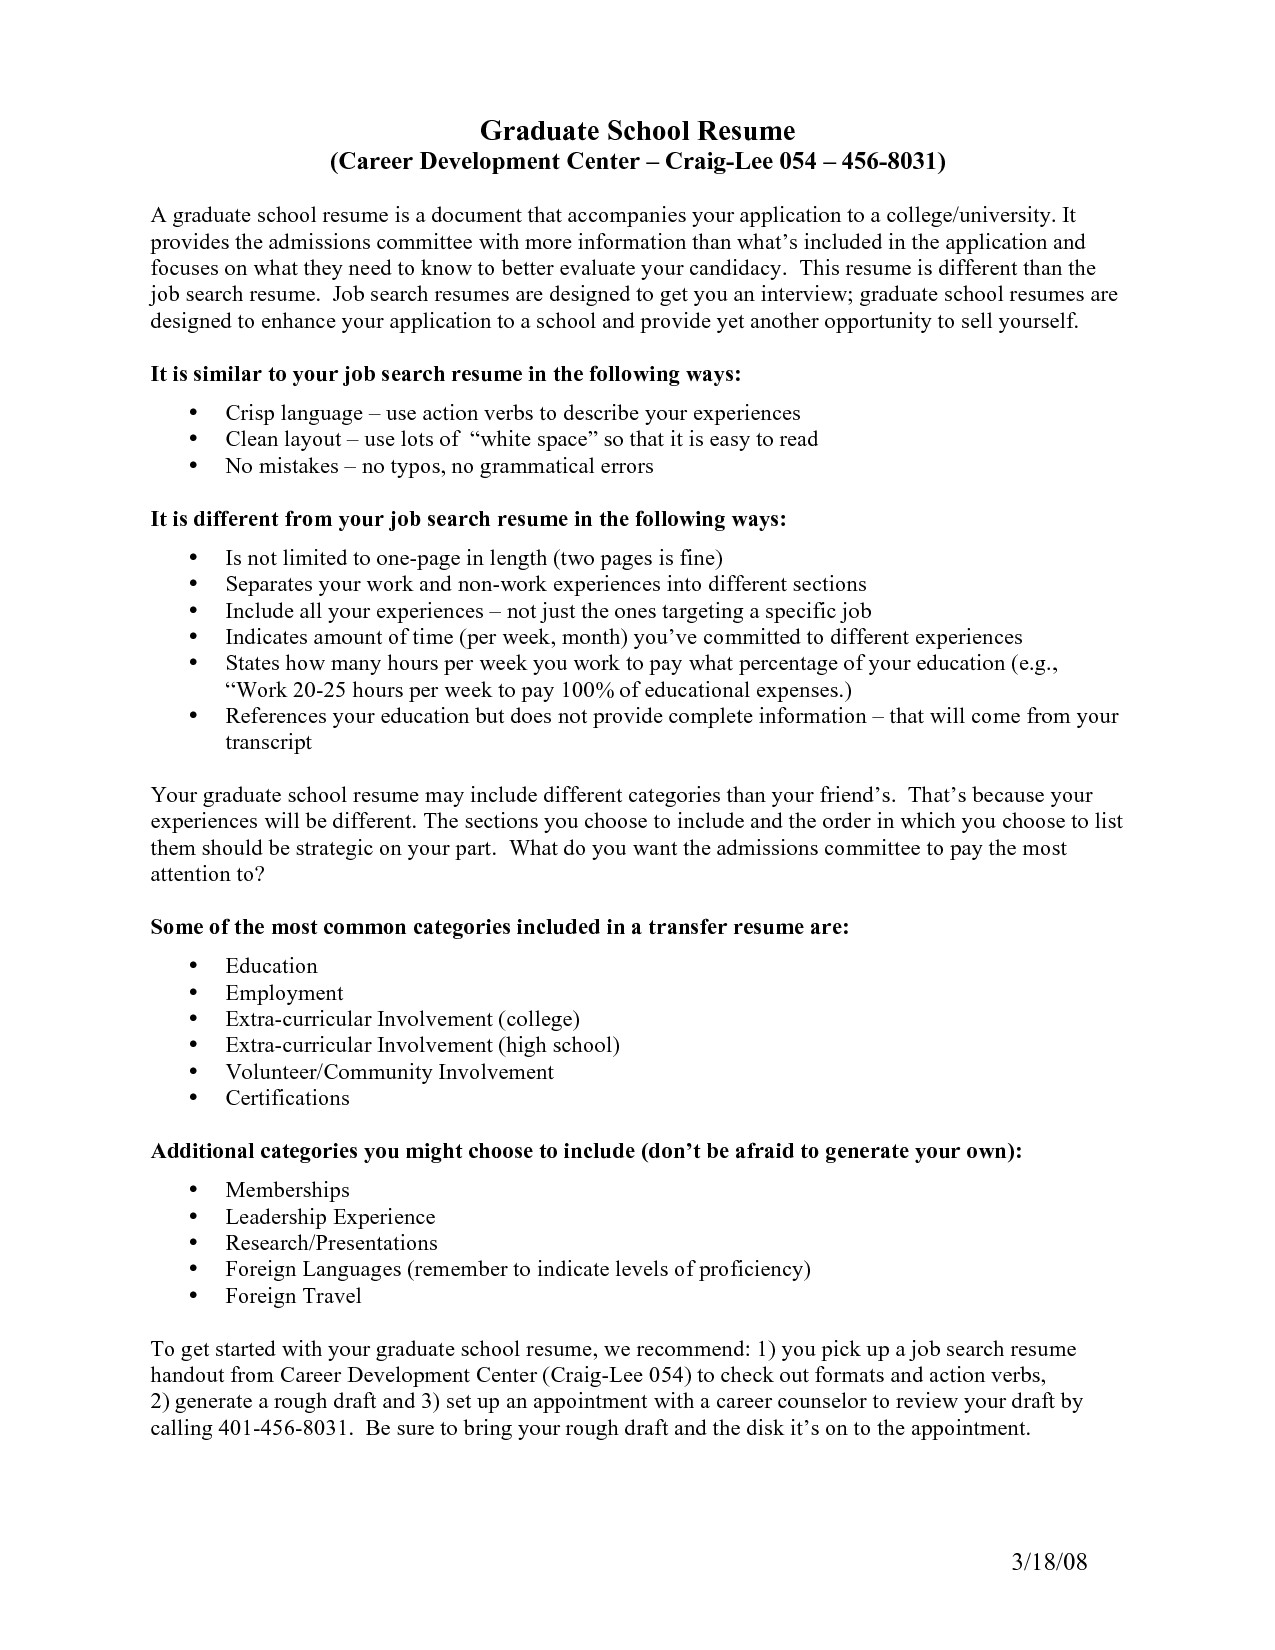 resume for graduate school template